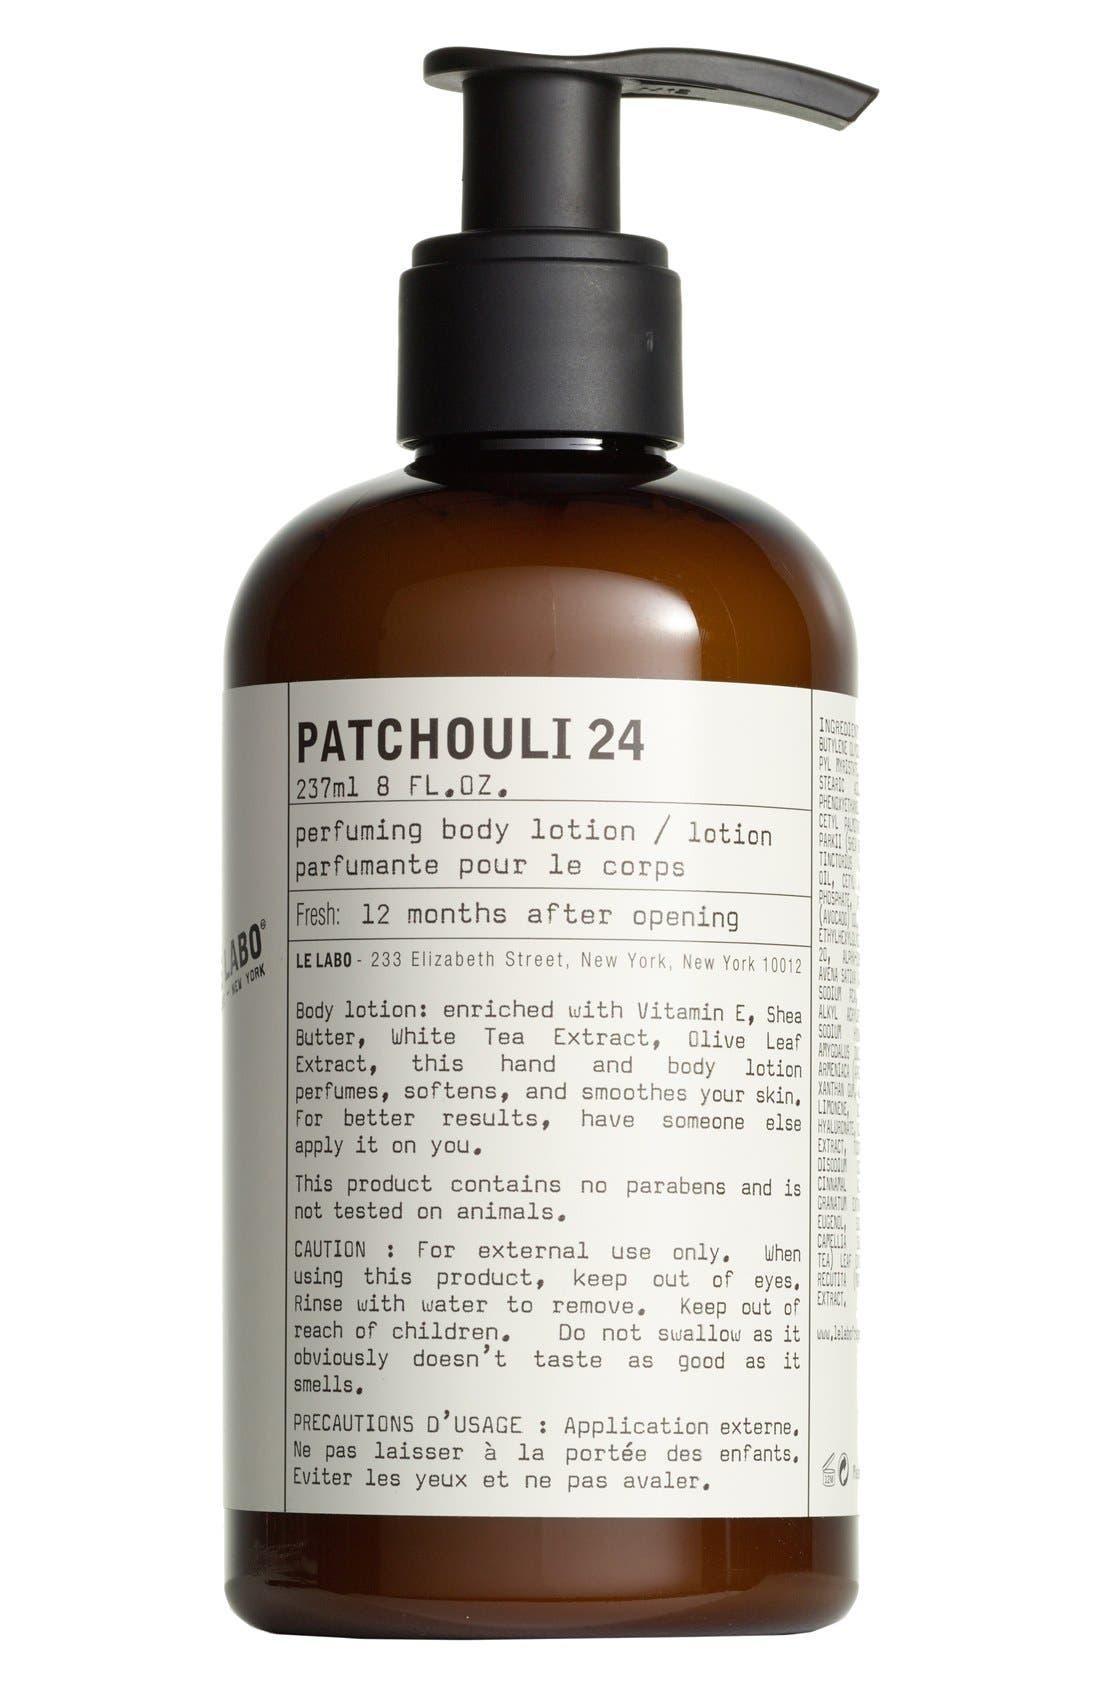 Patchouli 24 Body Lotion | Nordstrom